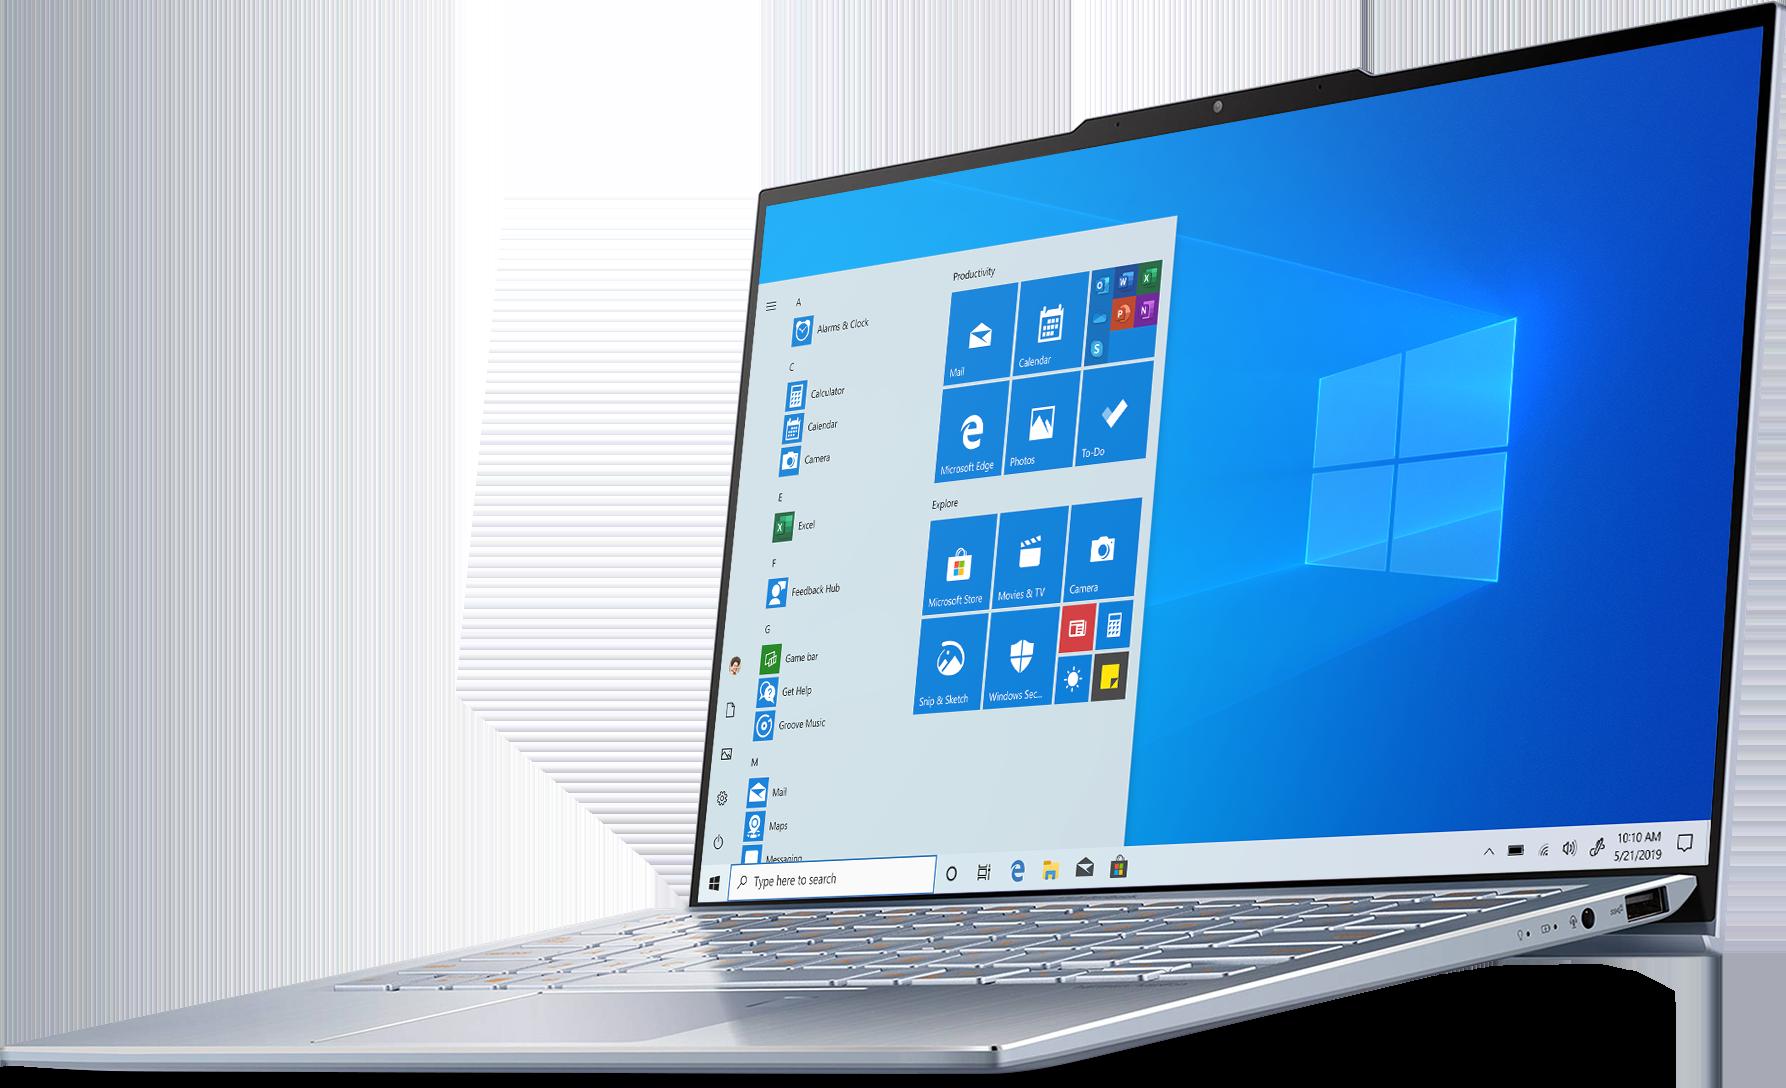 Asus Zenbook S UX392FN-XS77 Laptop